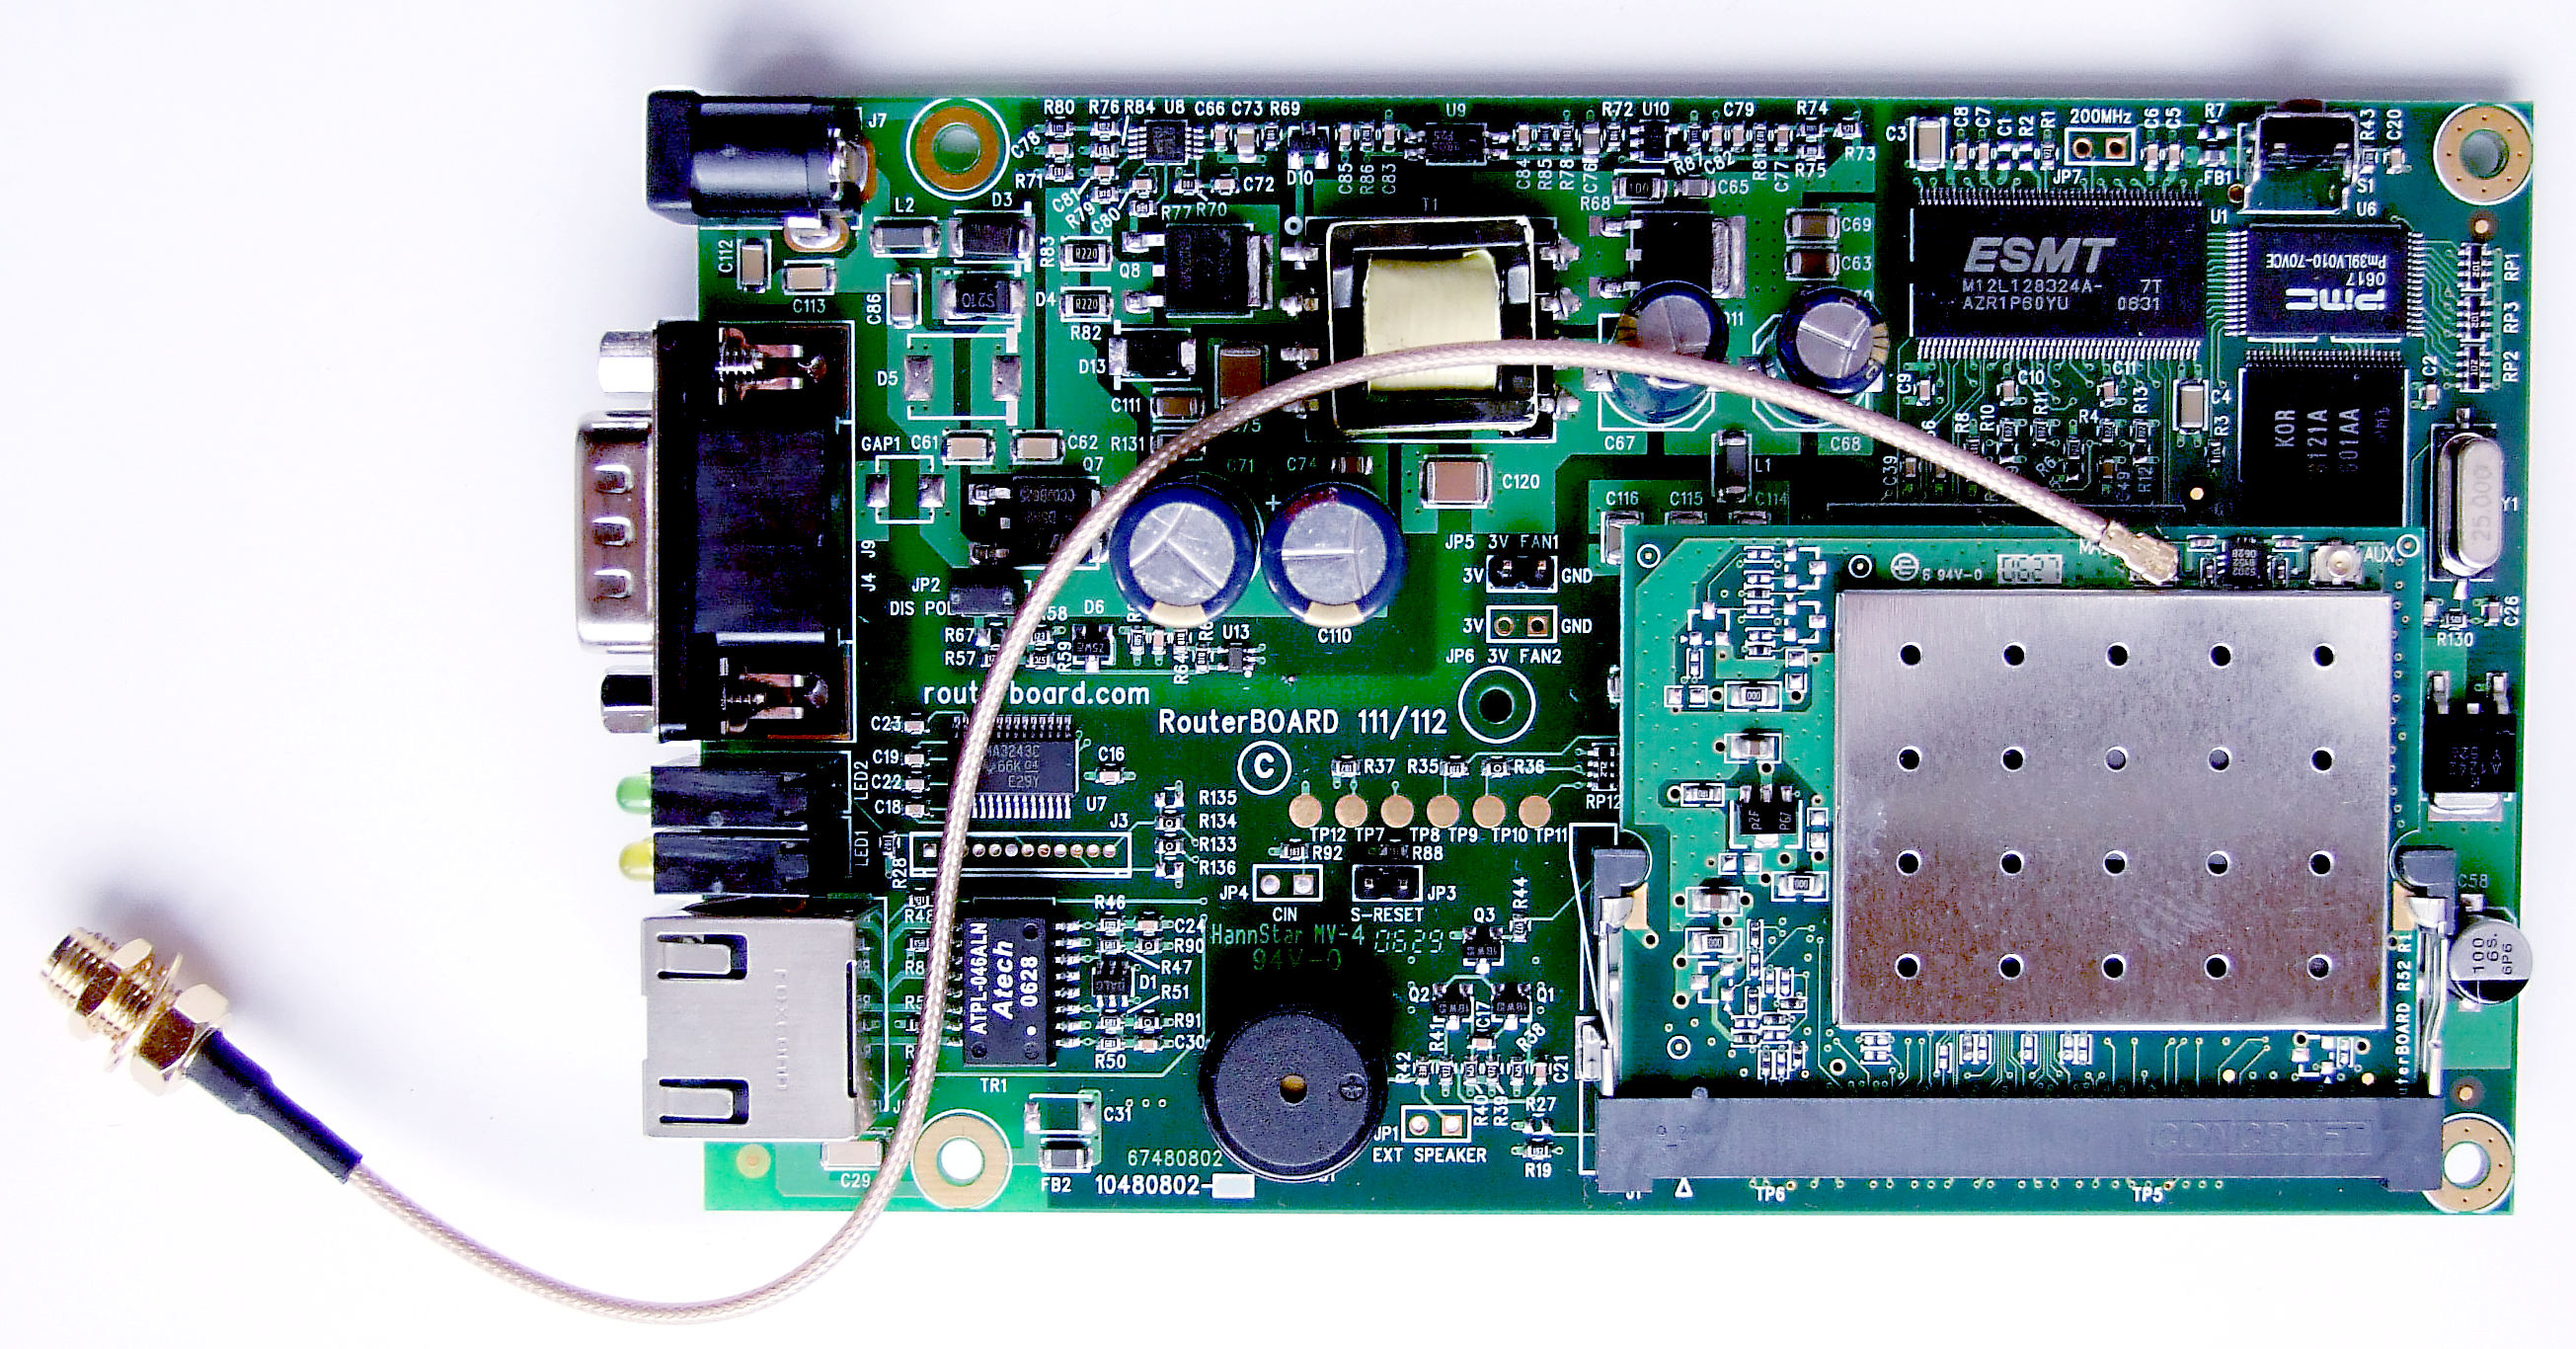 Модуль для коммутатора Huawei 4GE Electric Ports Bypass Card,with HW General Security Platform Softw